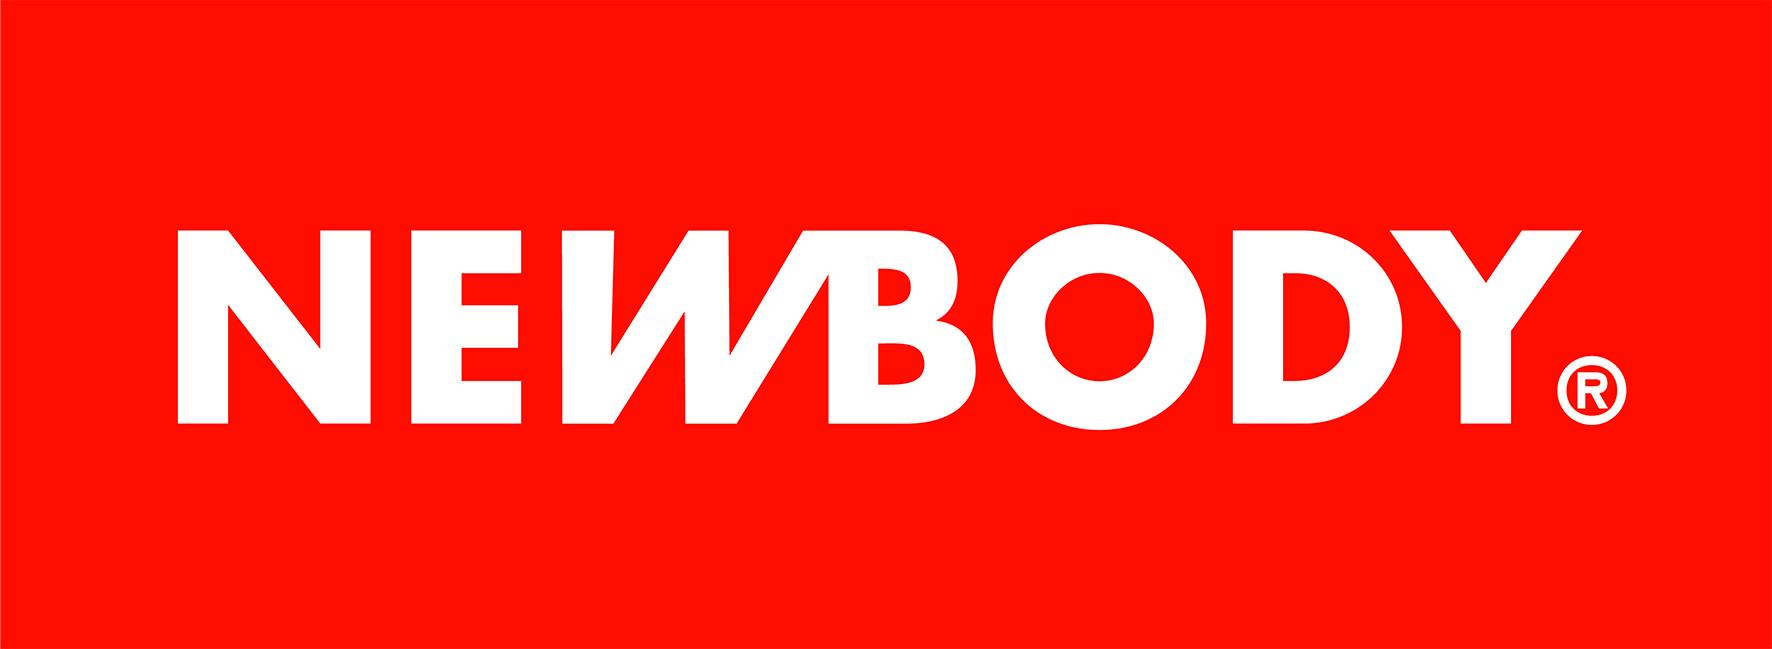 http://stadicup.fi/wp-content/uploads/2019/06/Newbody_logo_b_PMS.jpg